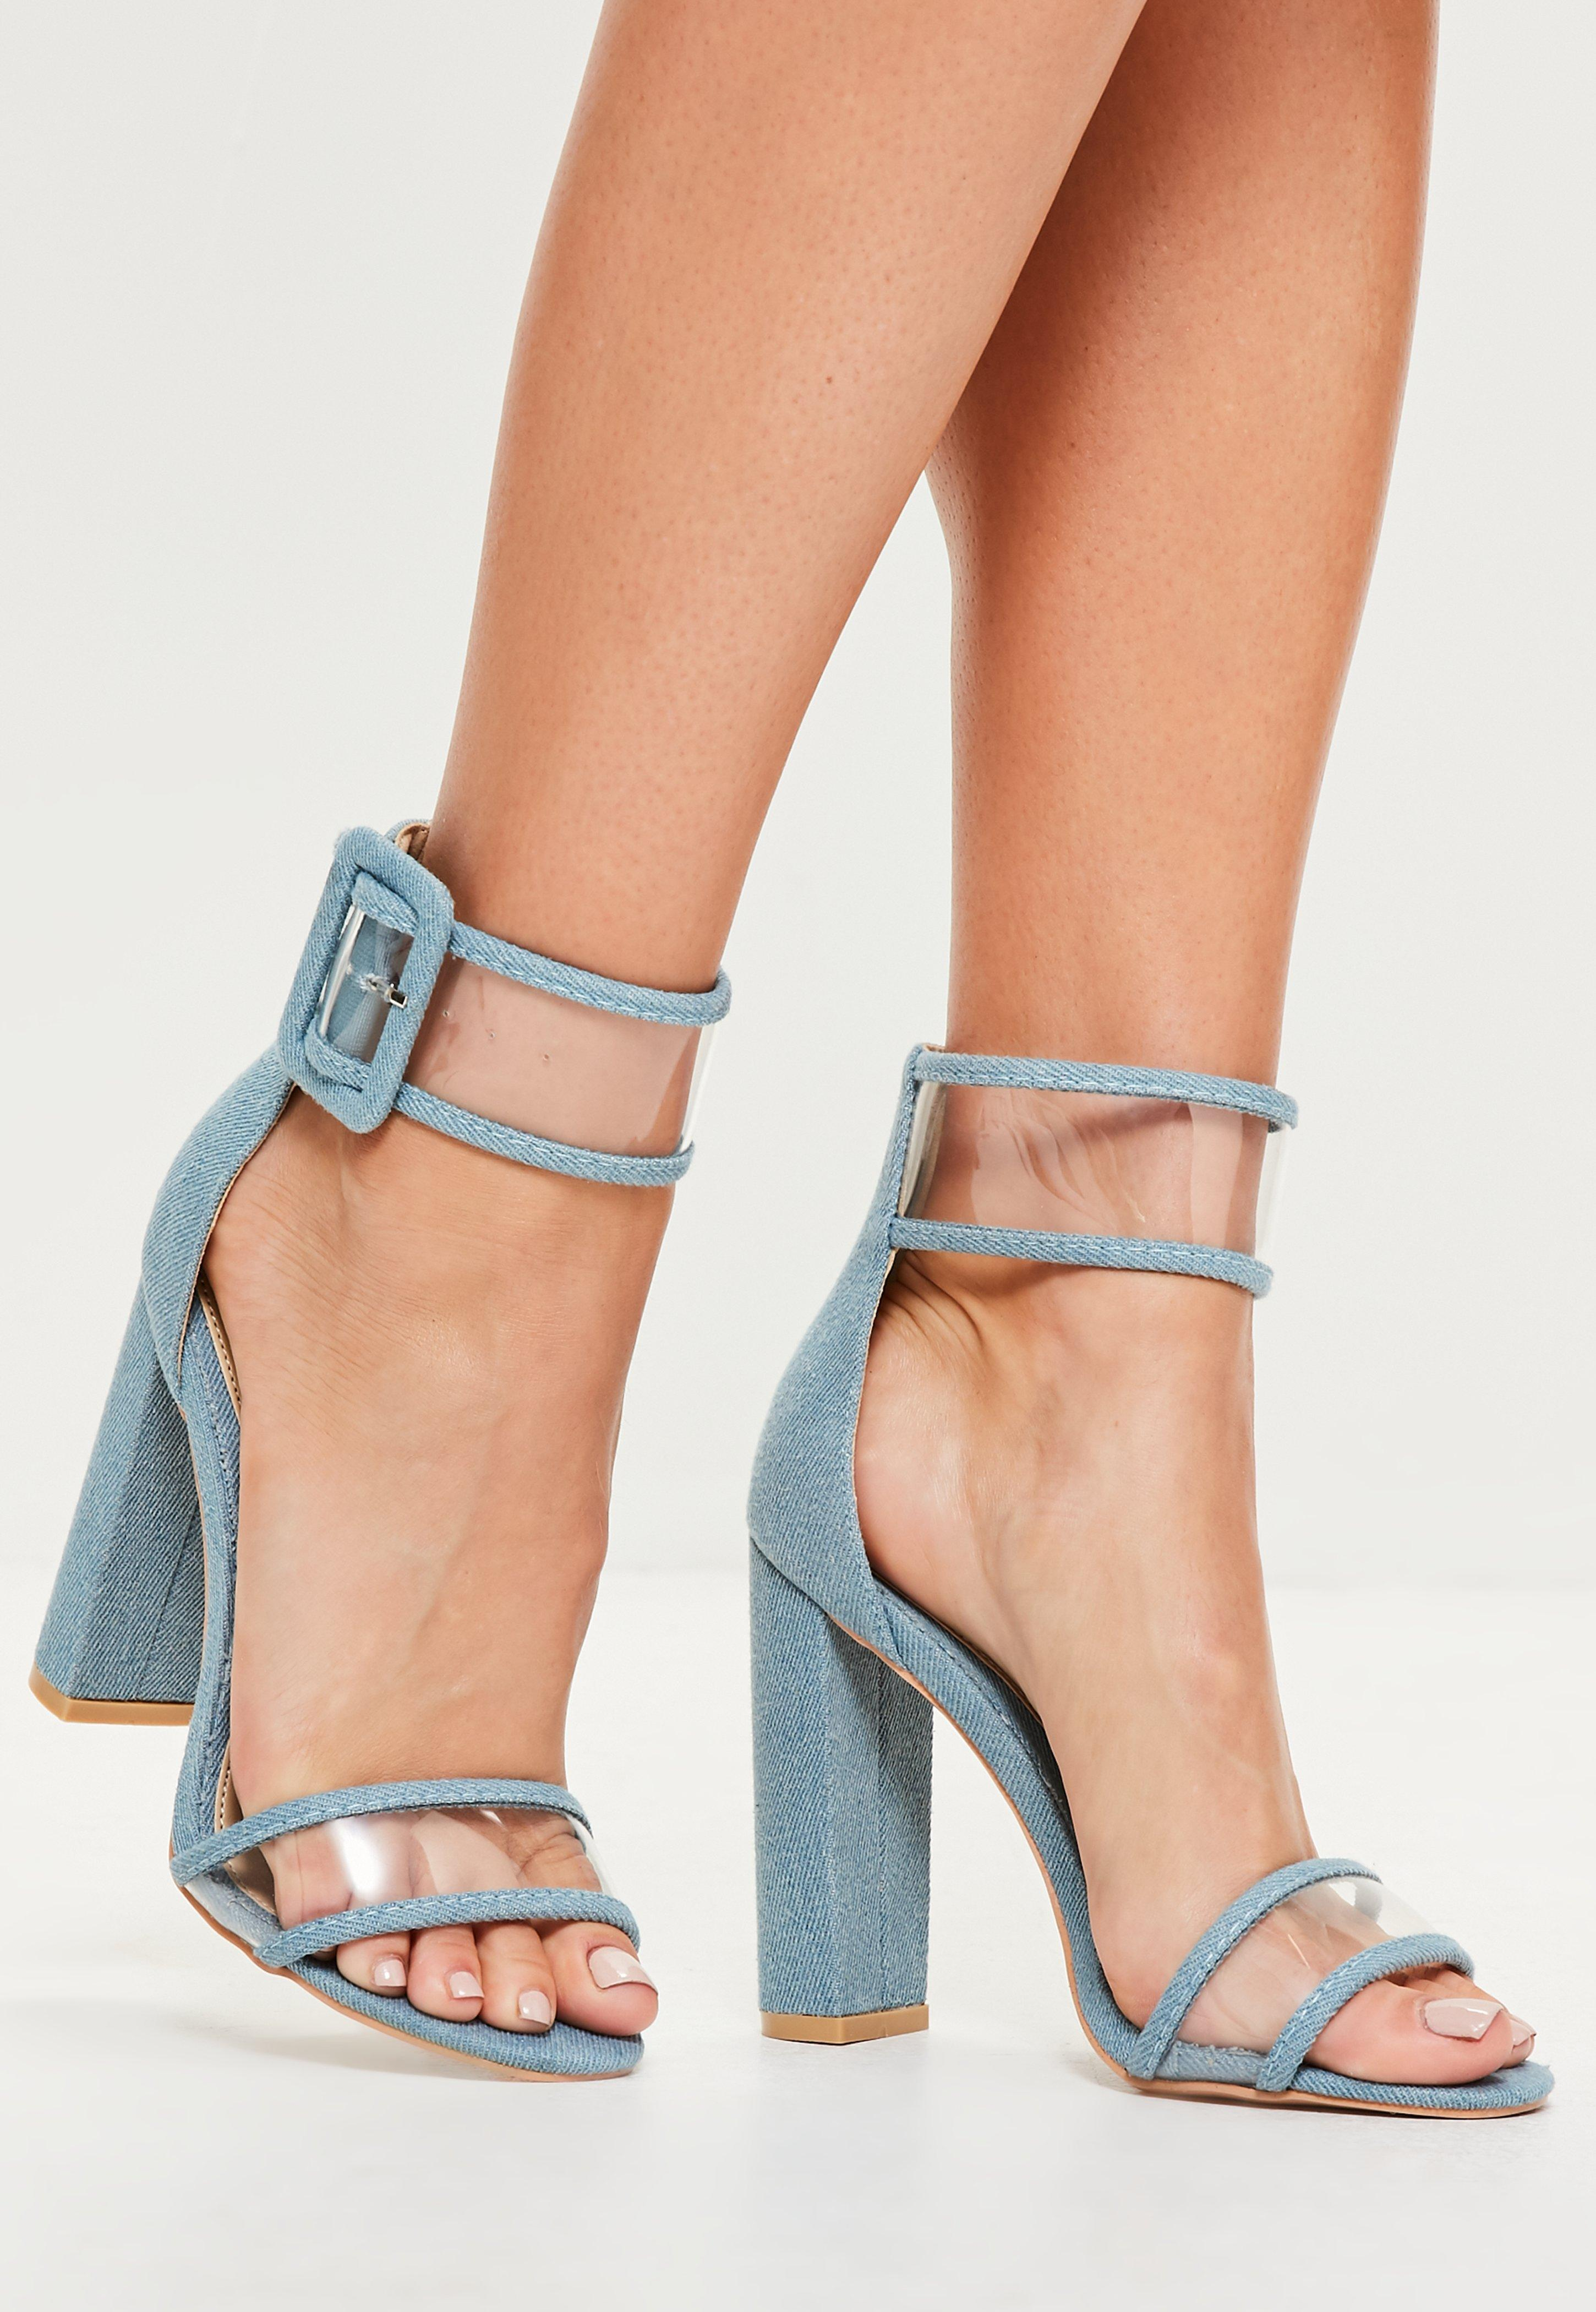 Clear Heeled Shoes Uk